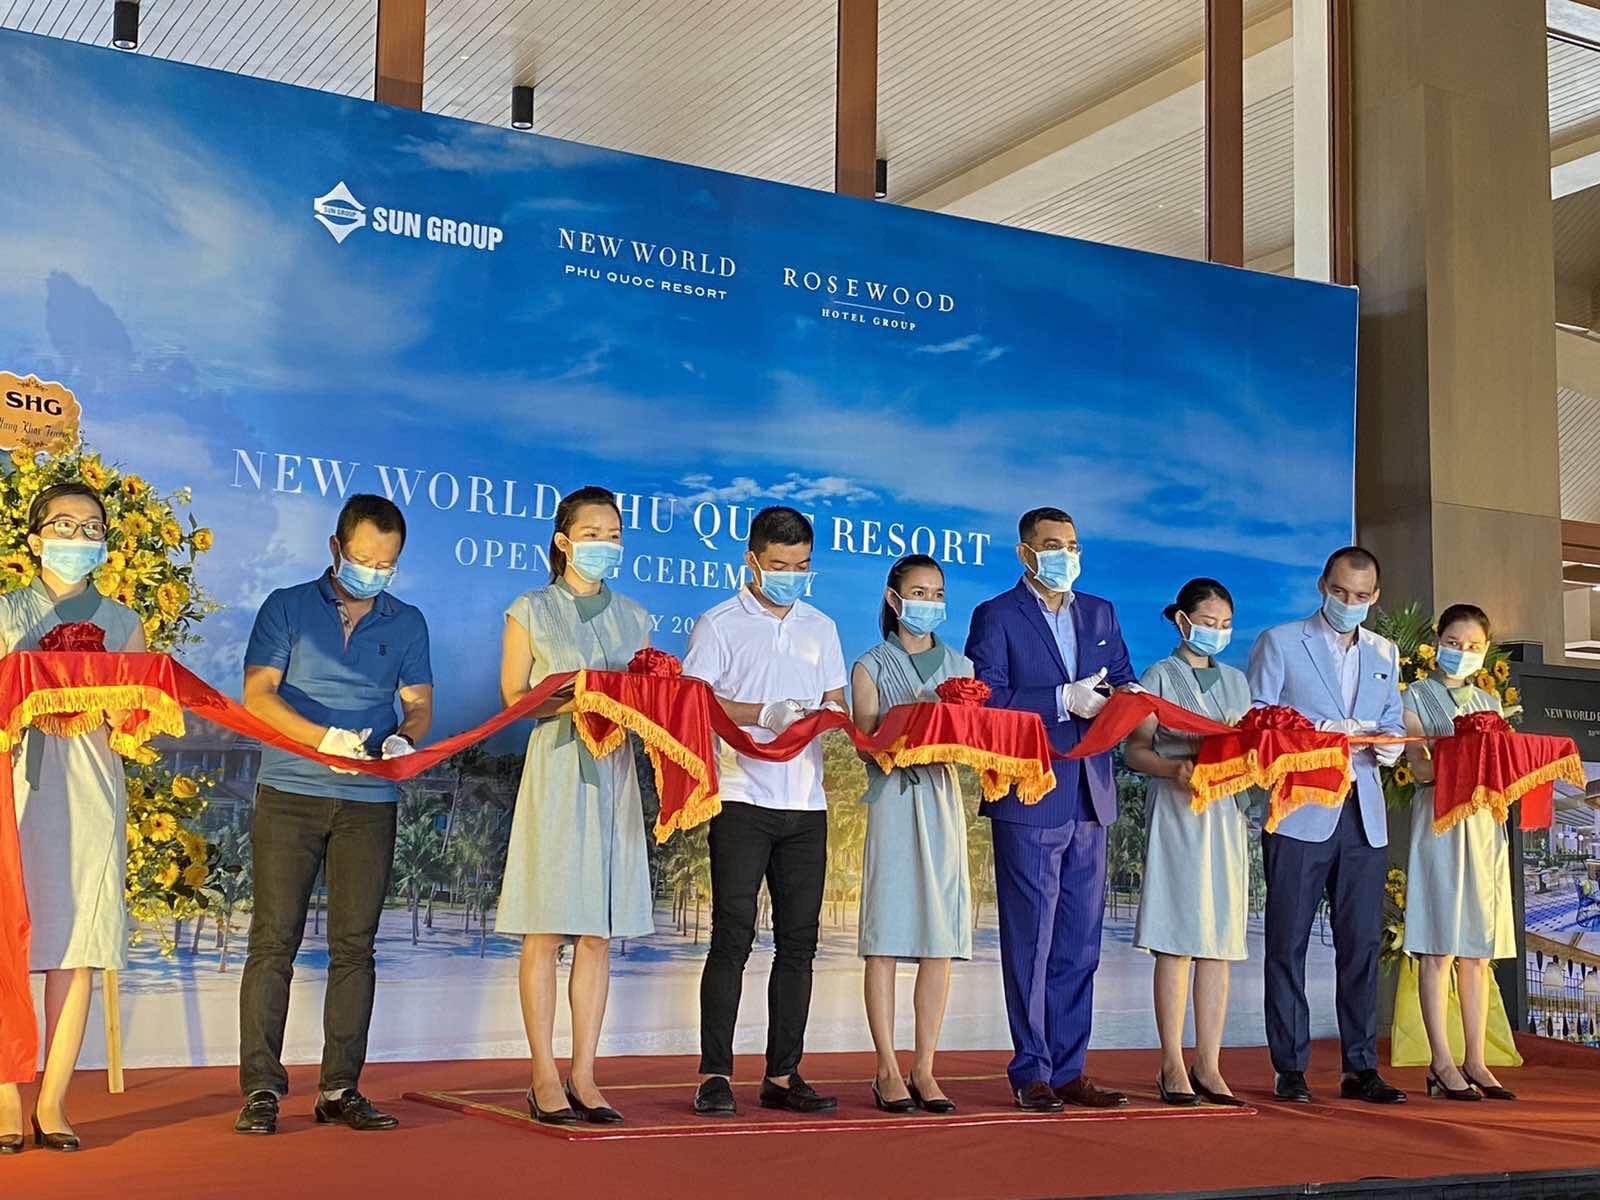 new-world-phu-quoc-resort-chinh-thuc-di-vao-hoat-dong